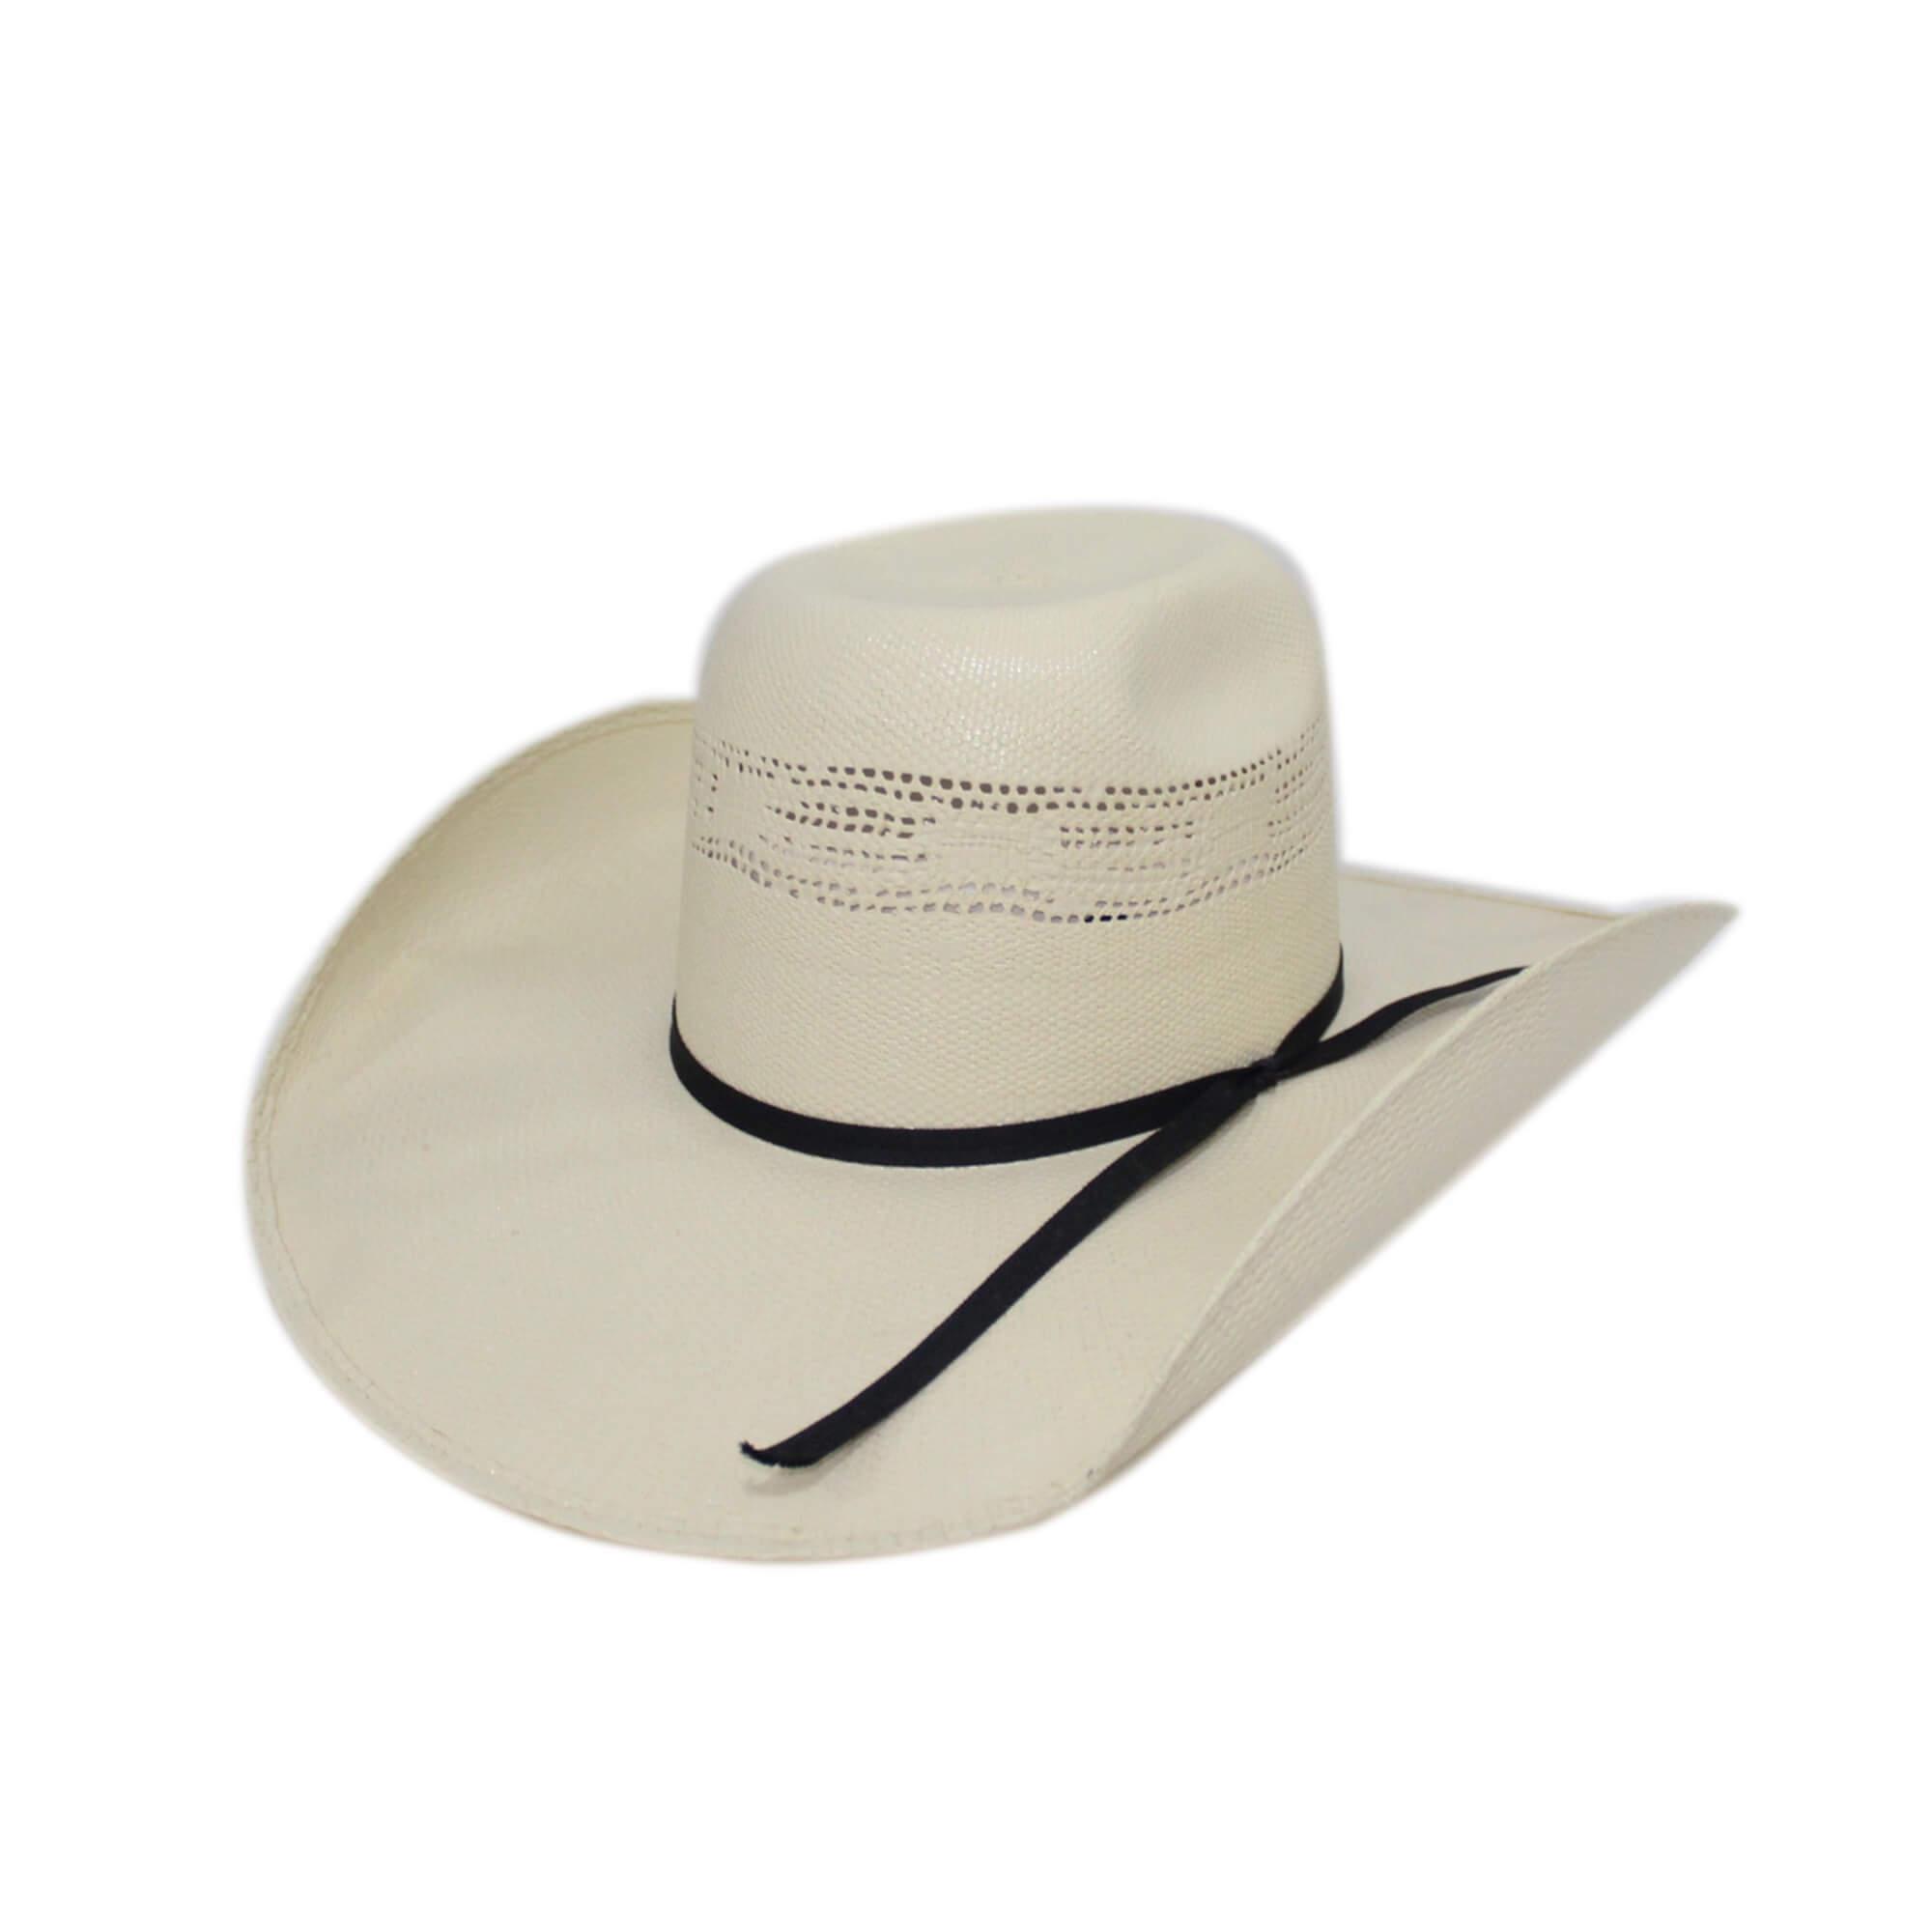 43d983be94a36 Chapéu Arena Hats Arkansas Palha Aba 12 - Arena Country Echaporã